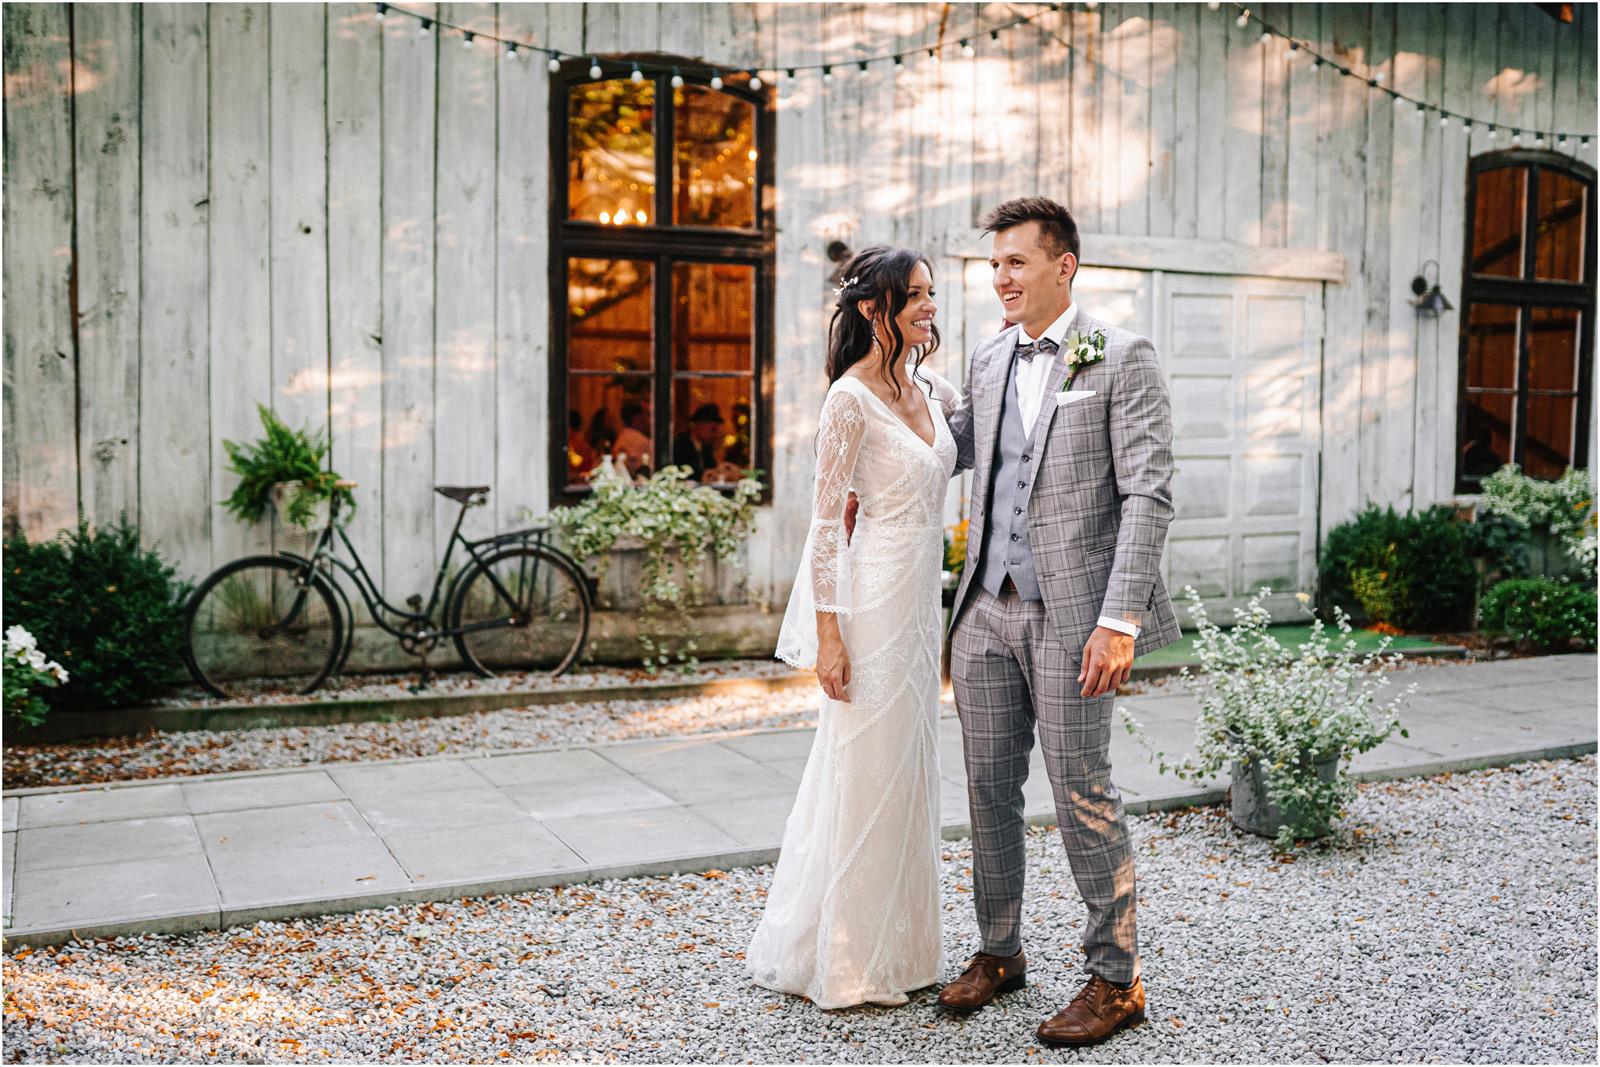 Ania & Mateusz | boho wesele w Stodole pod Kasztanami 91